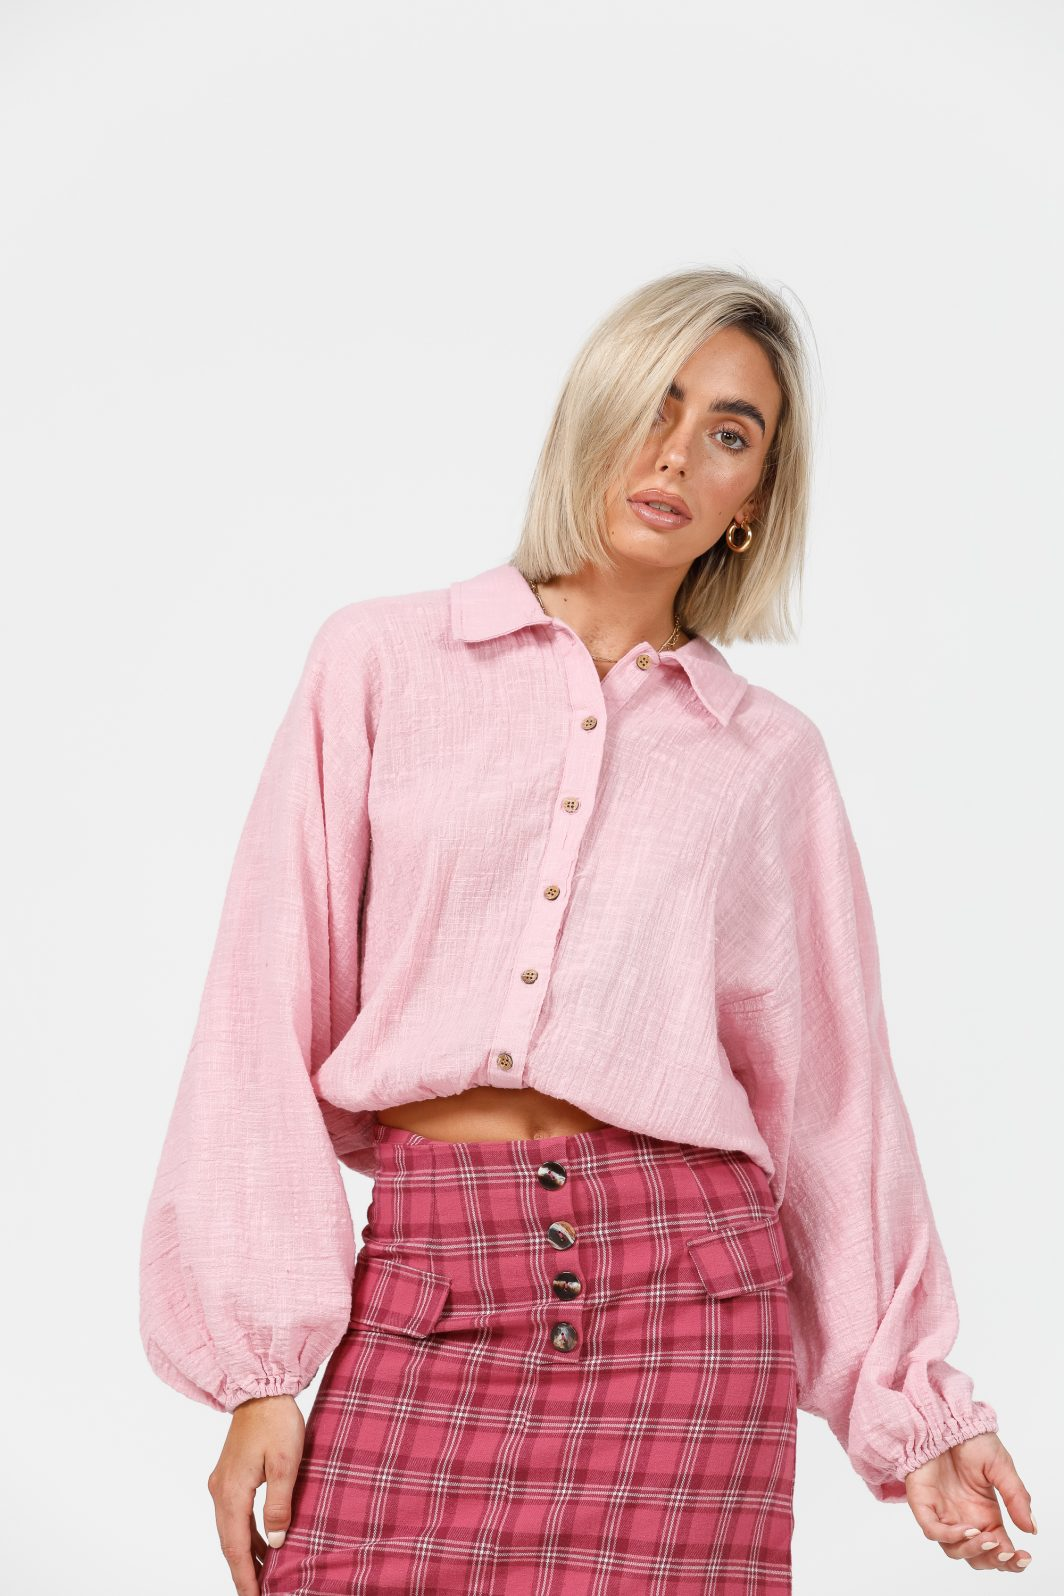 Daisy Says Penzance Shirt Pink